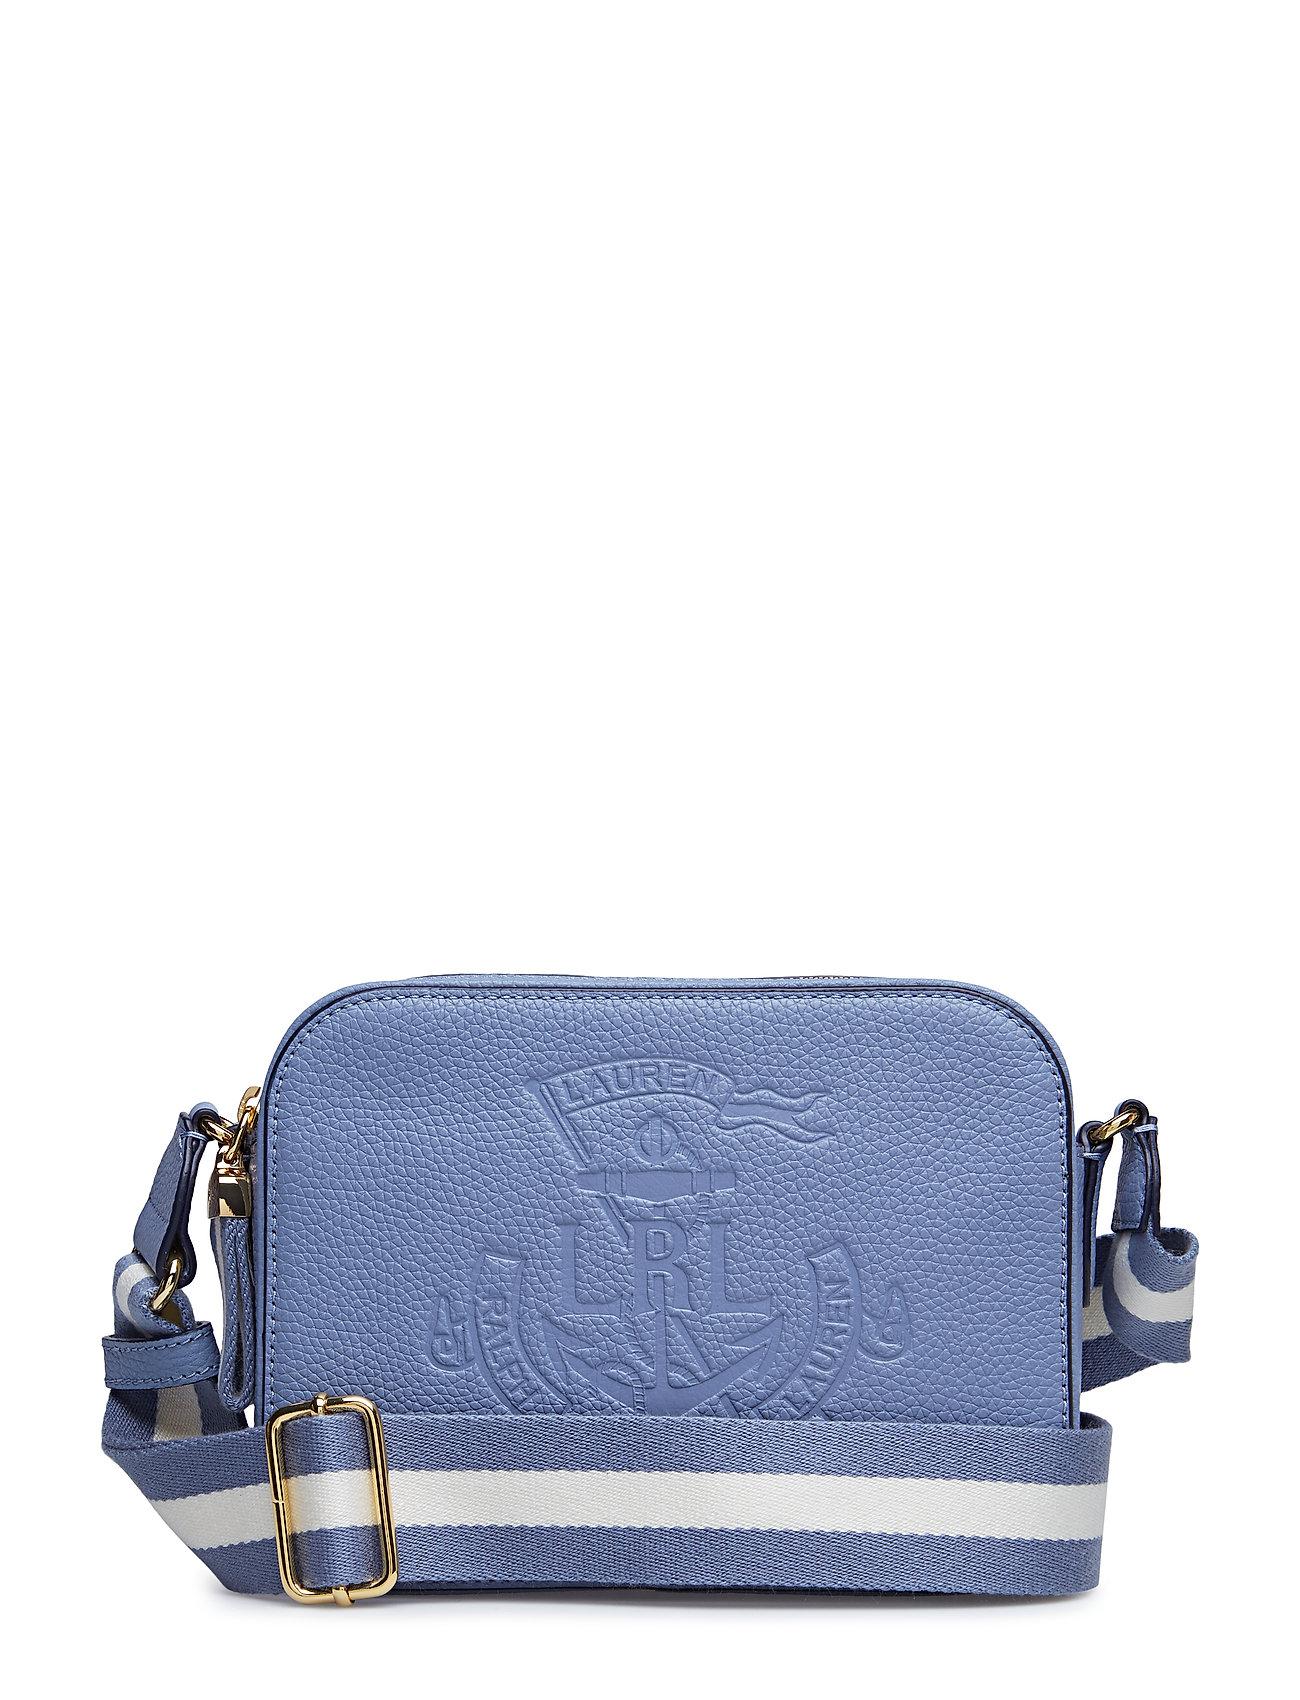 46e04f4251cd Anchor Leather Camera Bag (Blue Mist) (£225) - Lauren Ralph Lauren ...